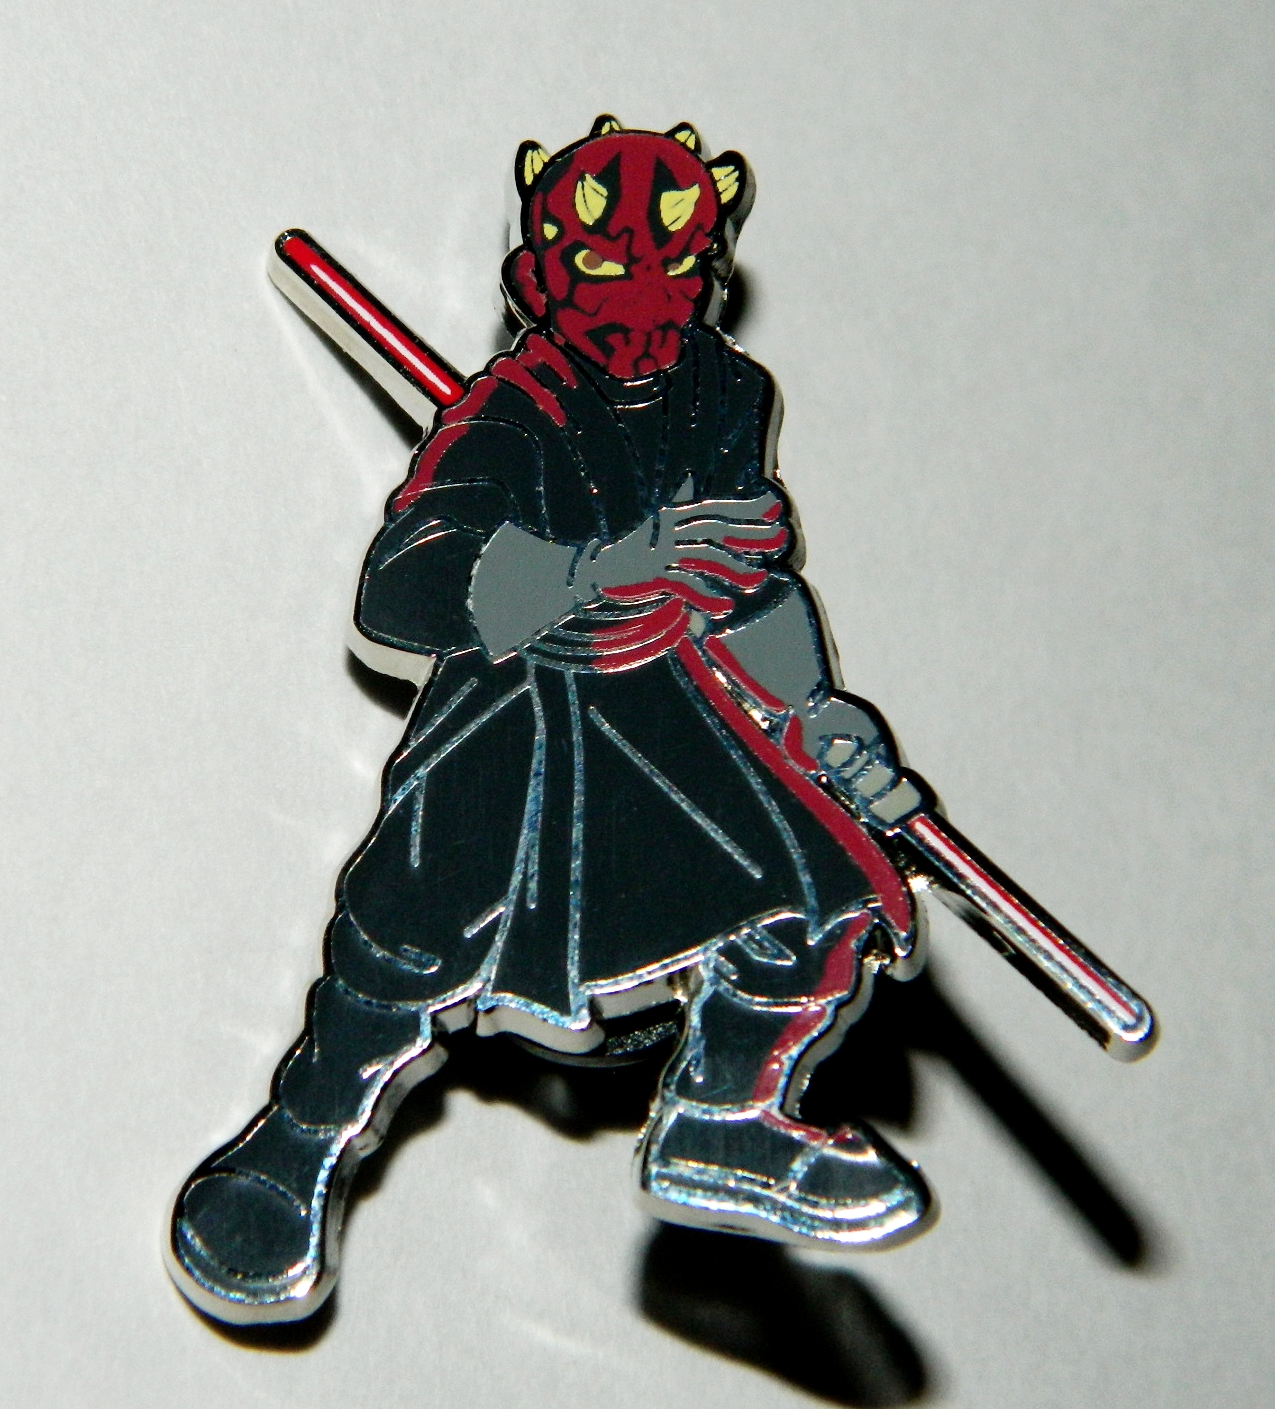 Star Wars Celebration Chicago 2019 Darth Maul Figure Exclusive Metal Enamel Pin